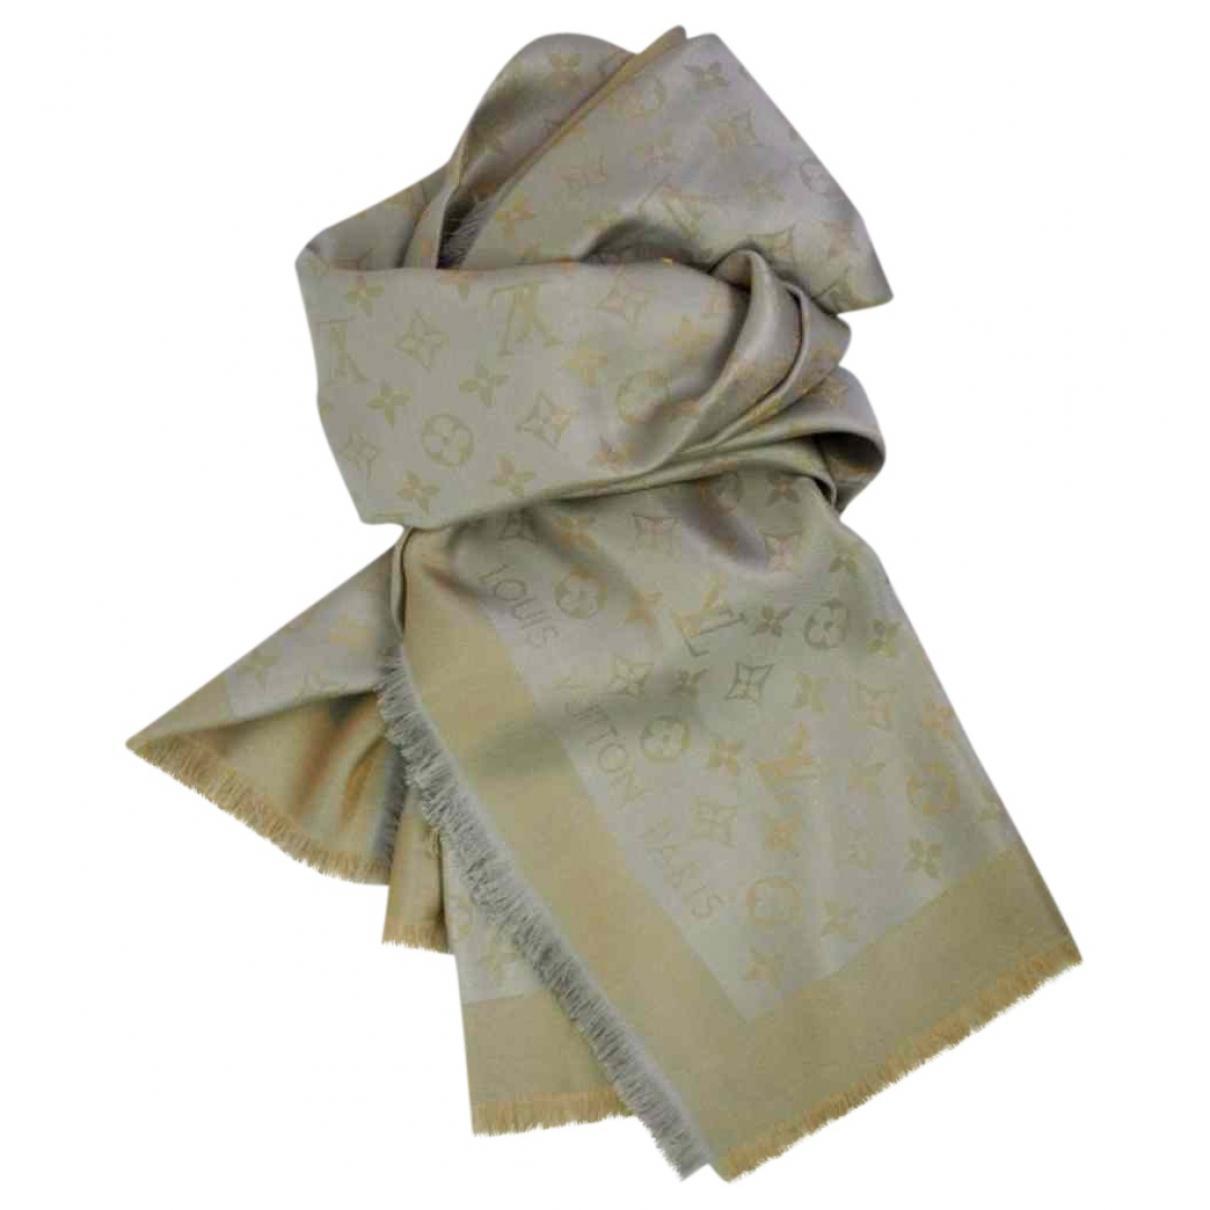 ac52da994d71 Louis Vuitton Pre-owned Châle Monogram Shine Grey Silk Scarves in ...